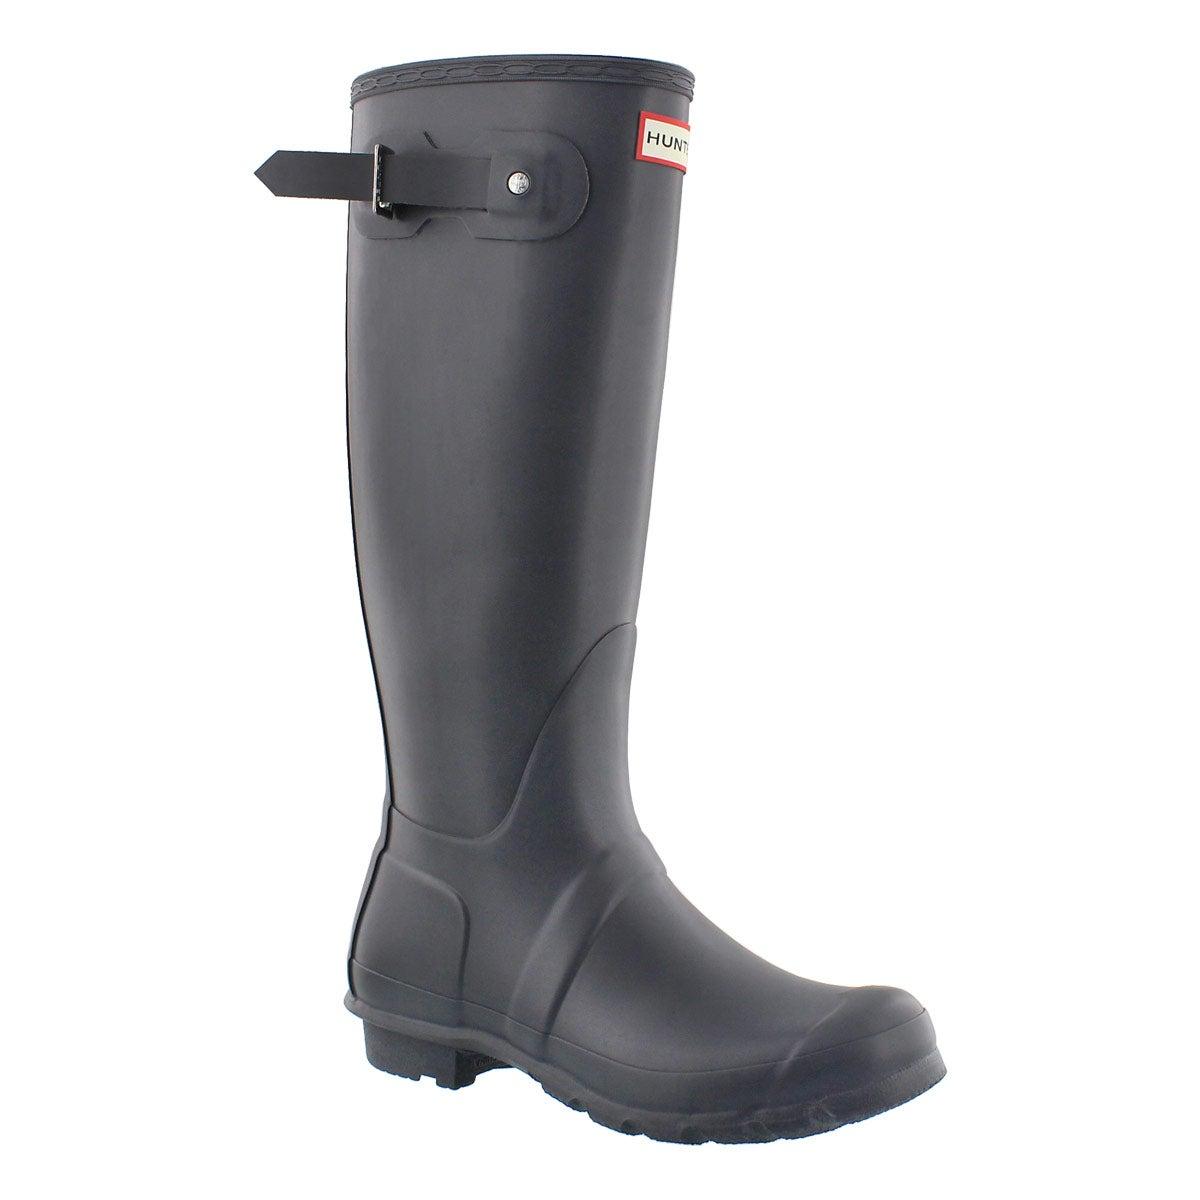 Women's ORIGINAL TALL CLASSIC grey rain boots